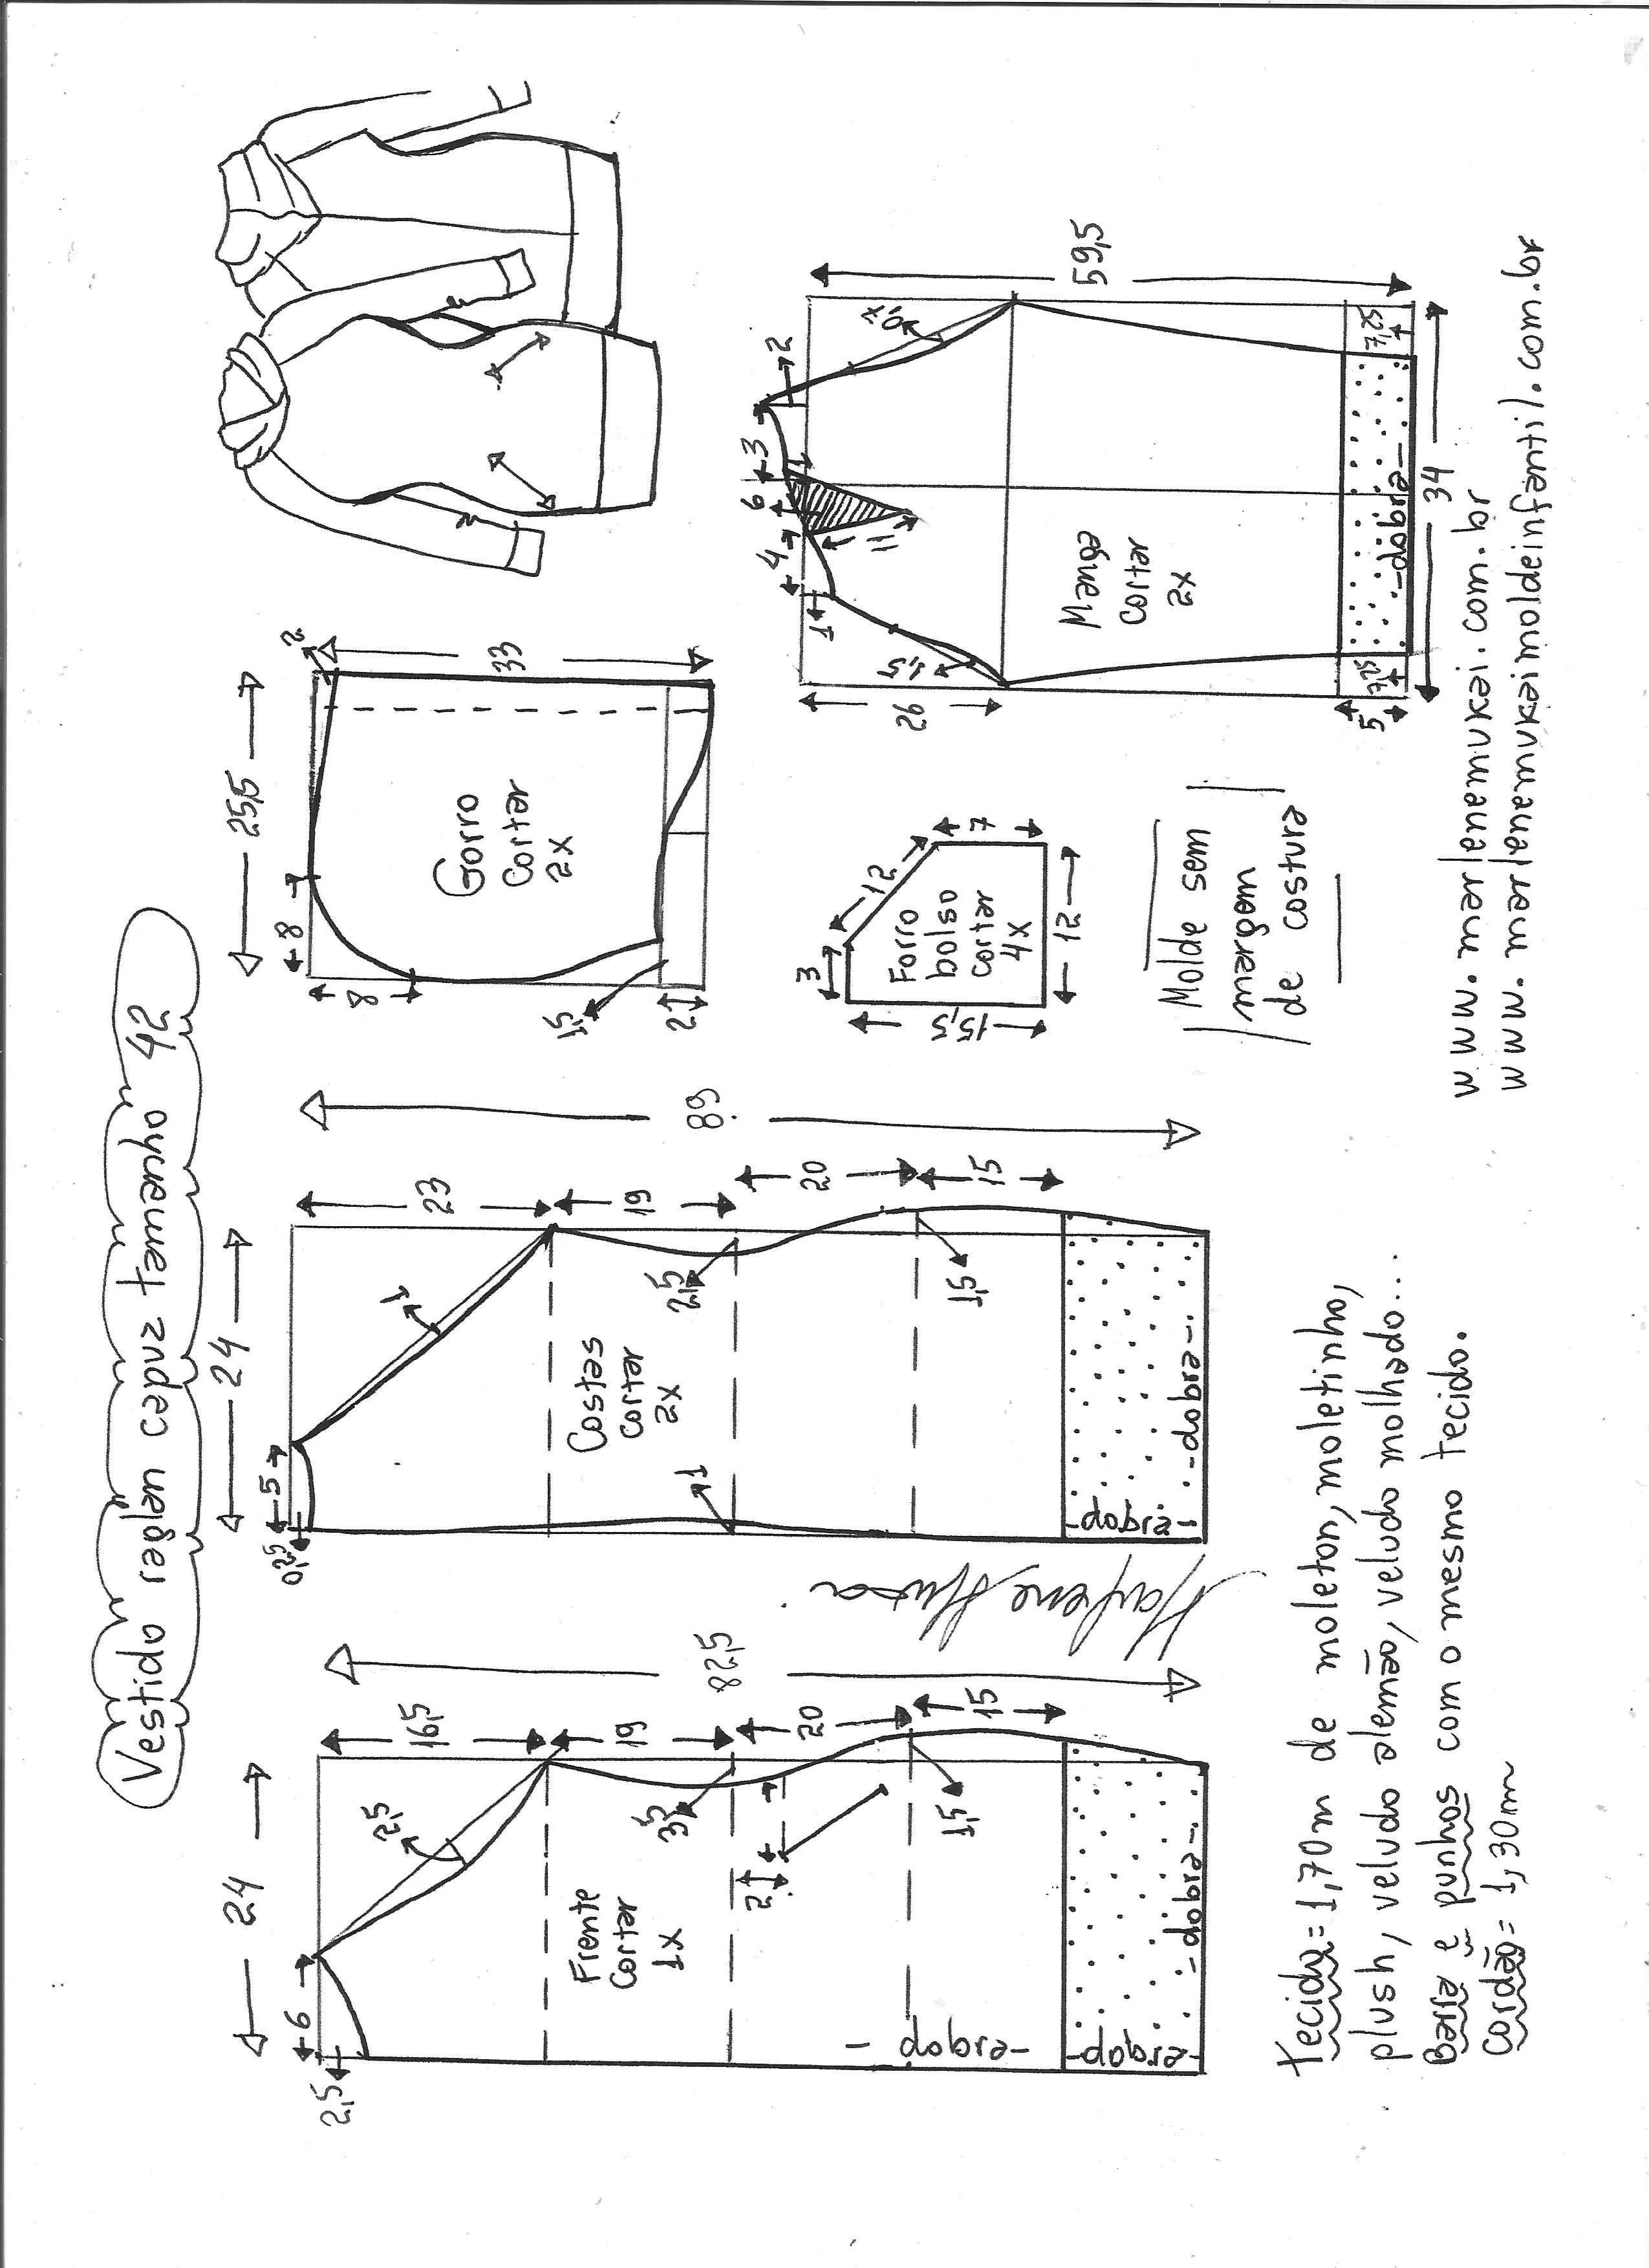 Vestido manga raglan e capuz | ,corte,patrones y costura | Pinterest ...